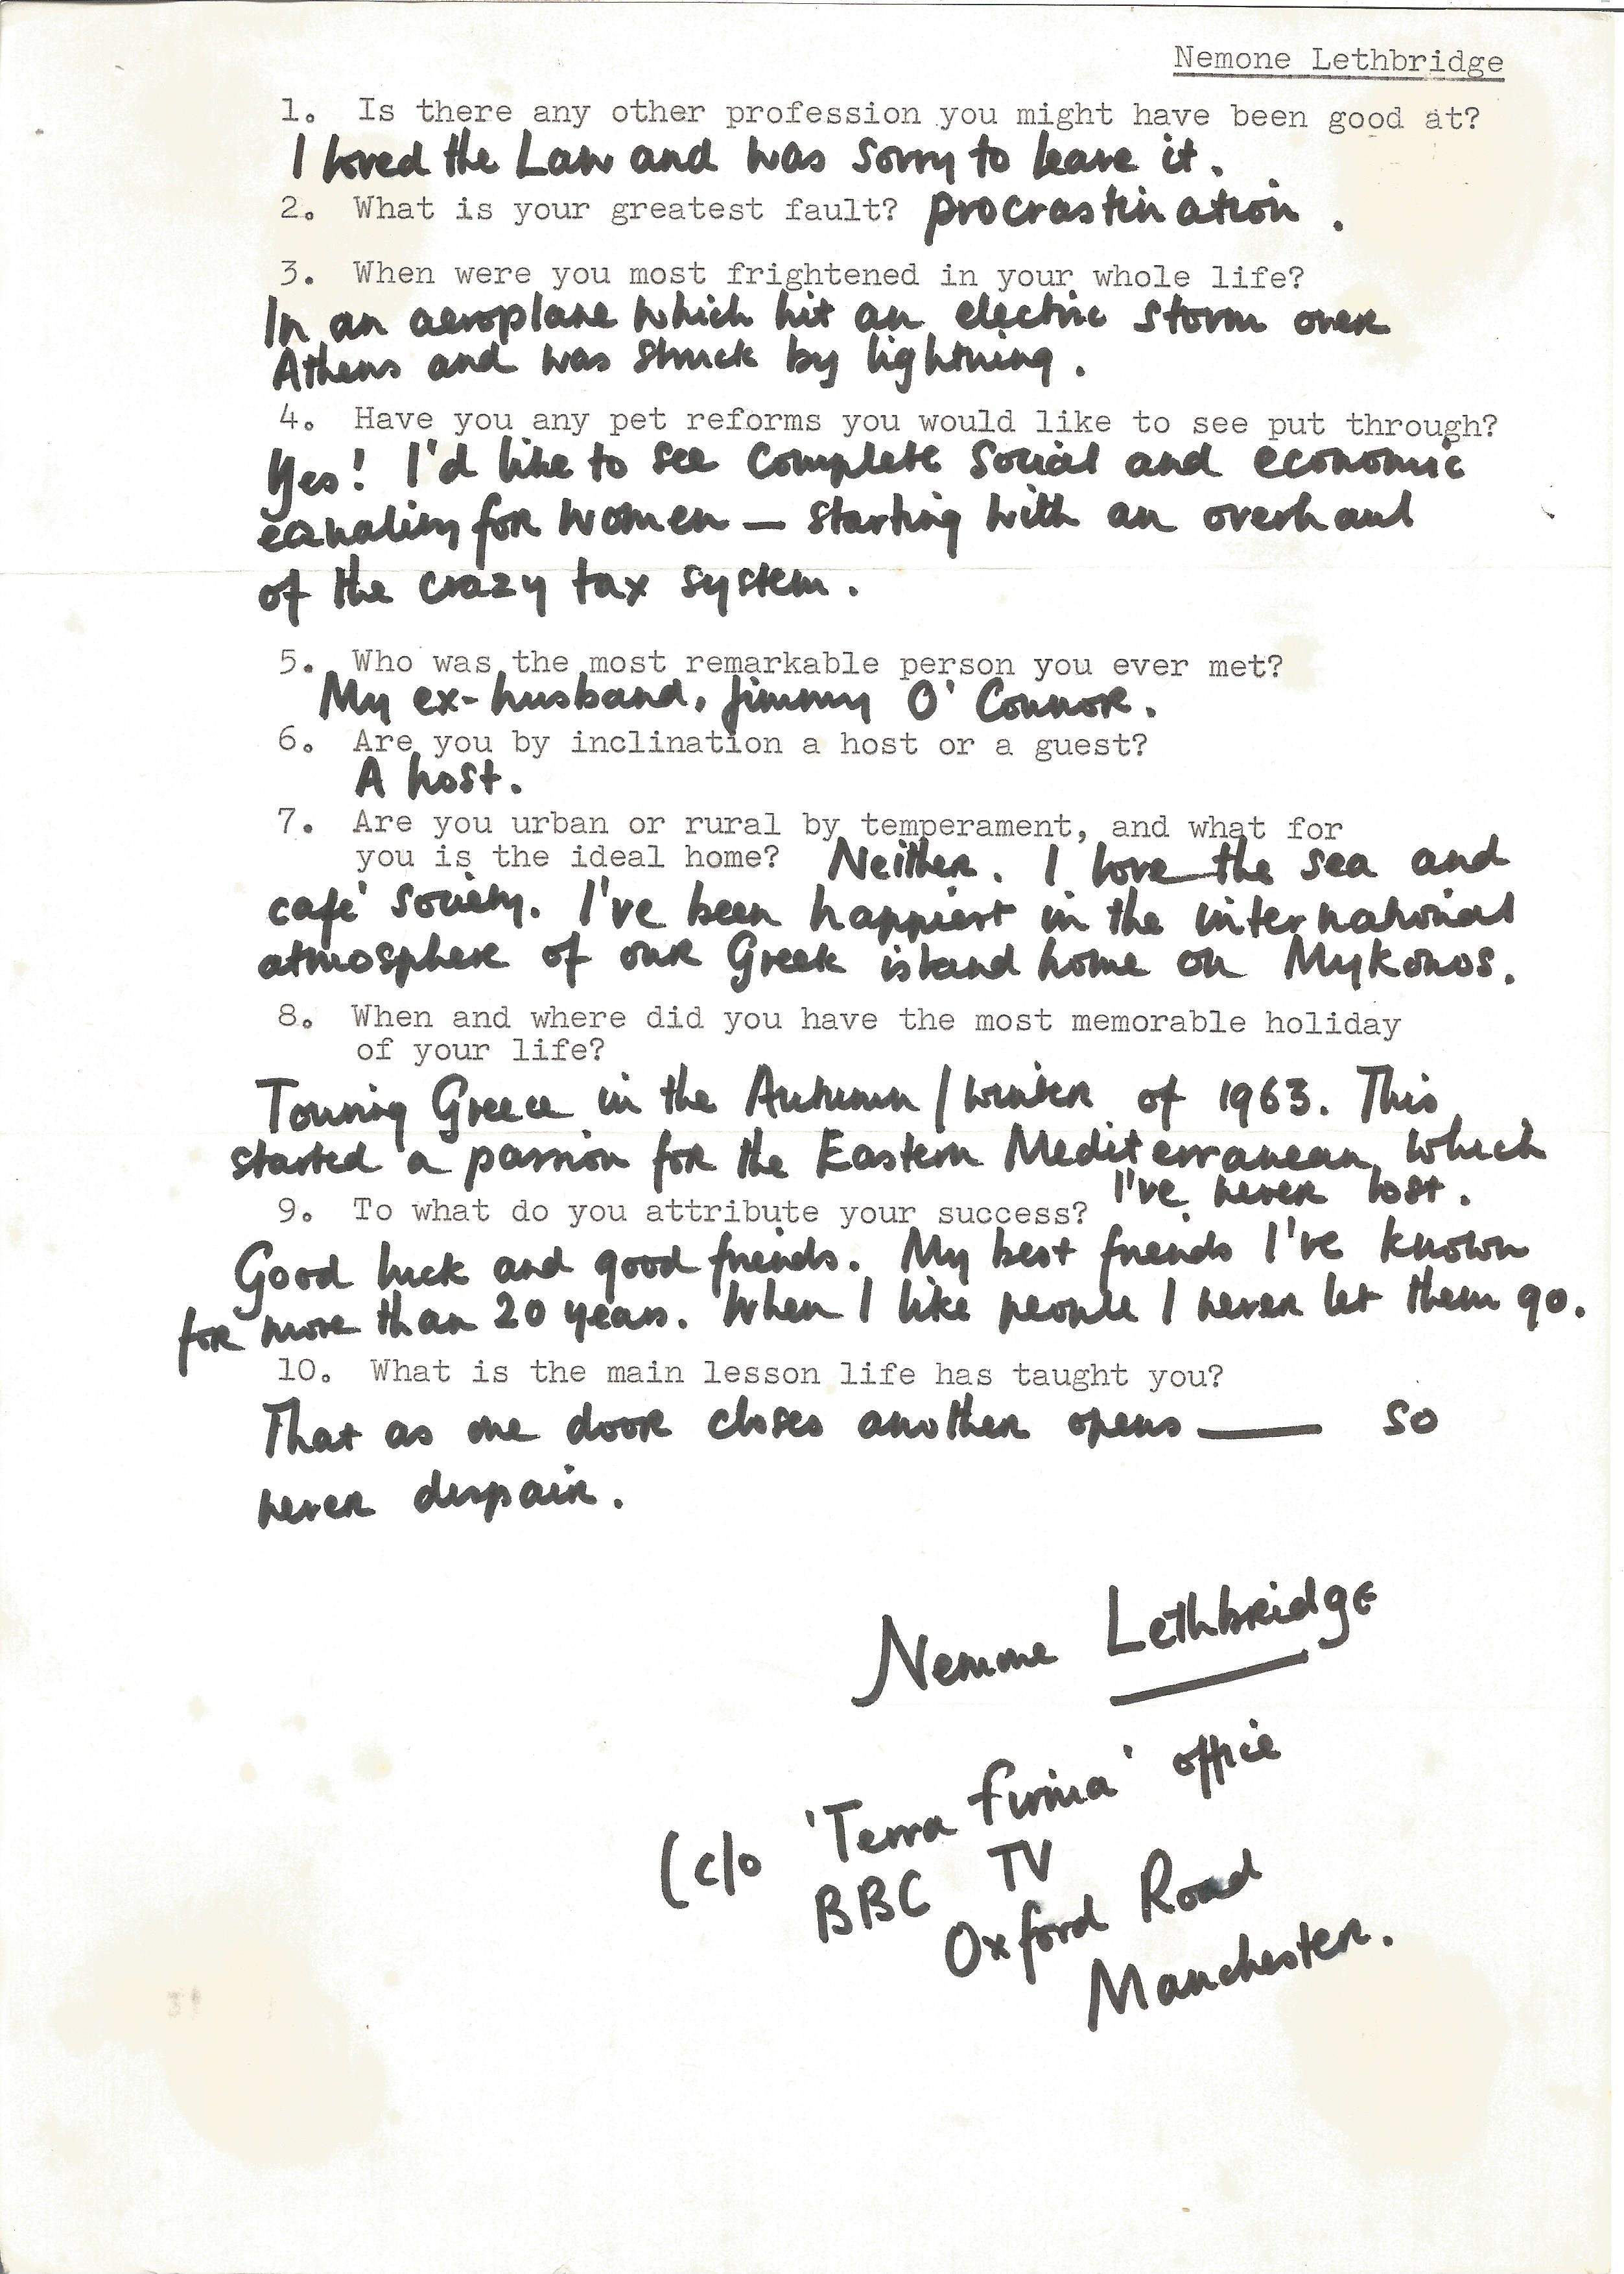 Playwright Barrister Nemone Lethbridge, handwritten replies on a questionnaire